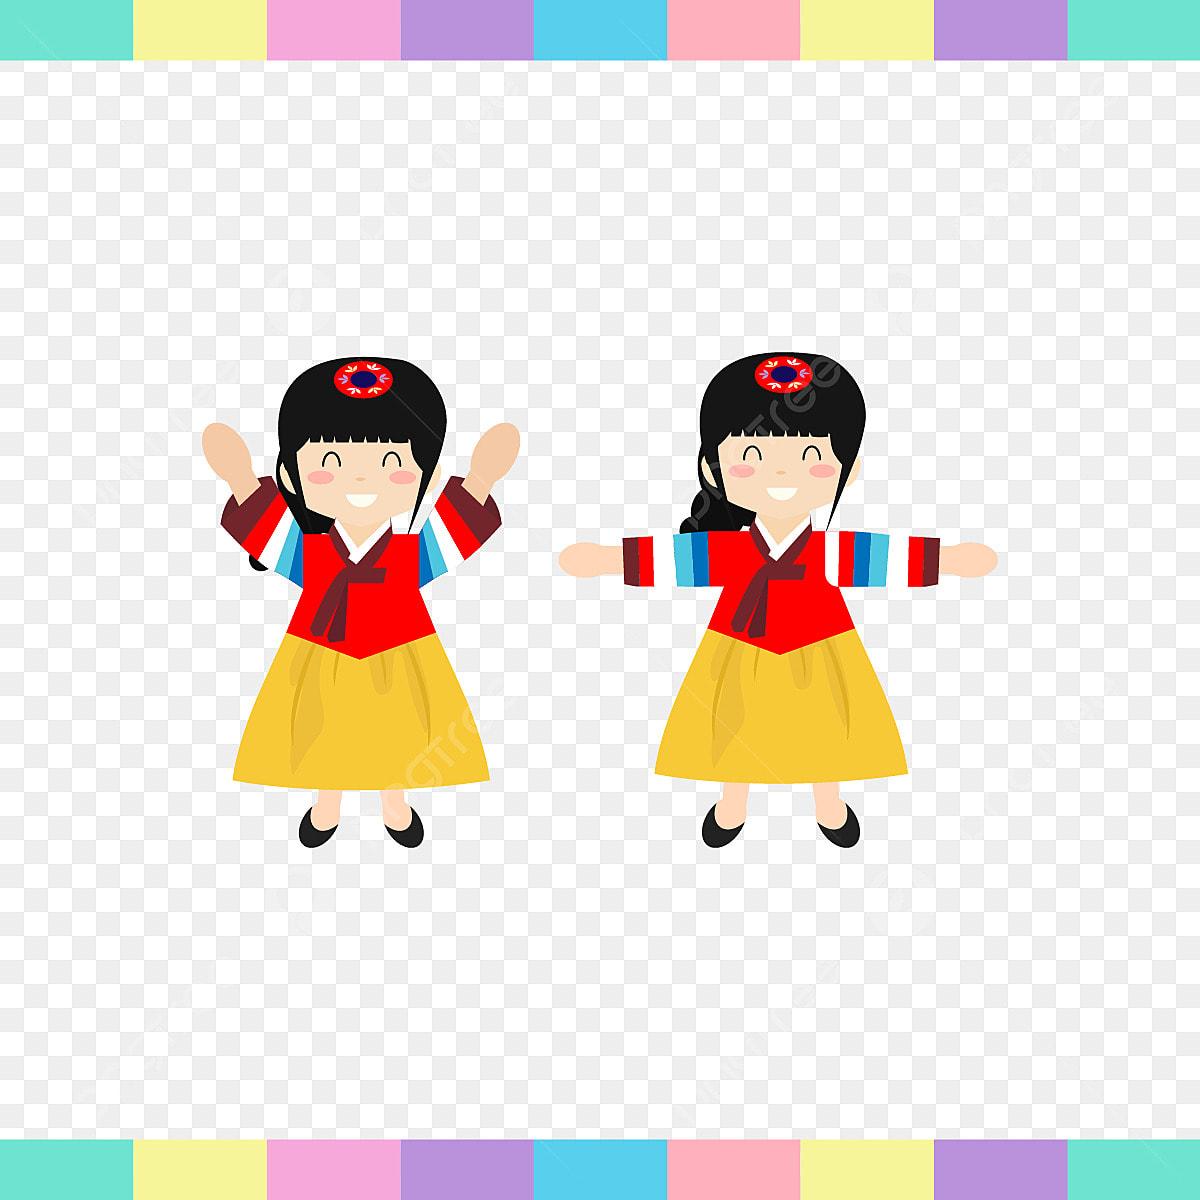 Katakan Hai Gadis Kecil Korea Pakaian Asia Asia Musim